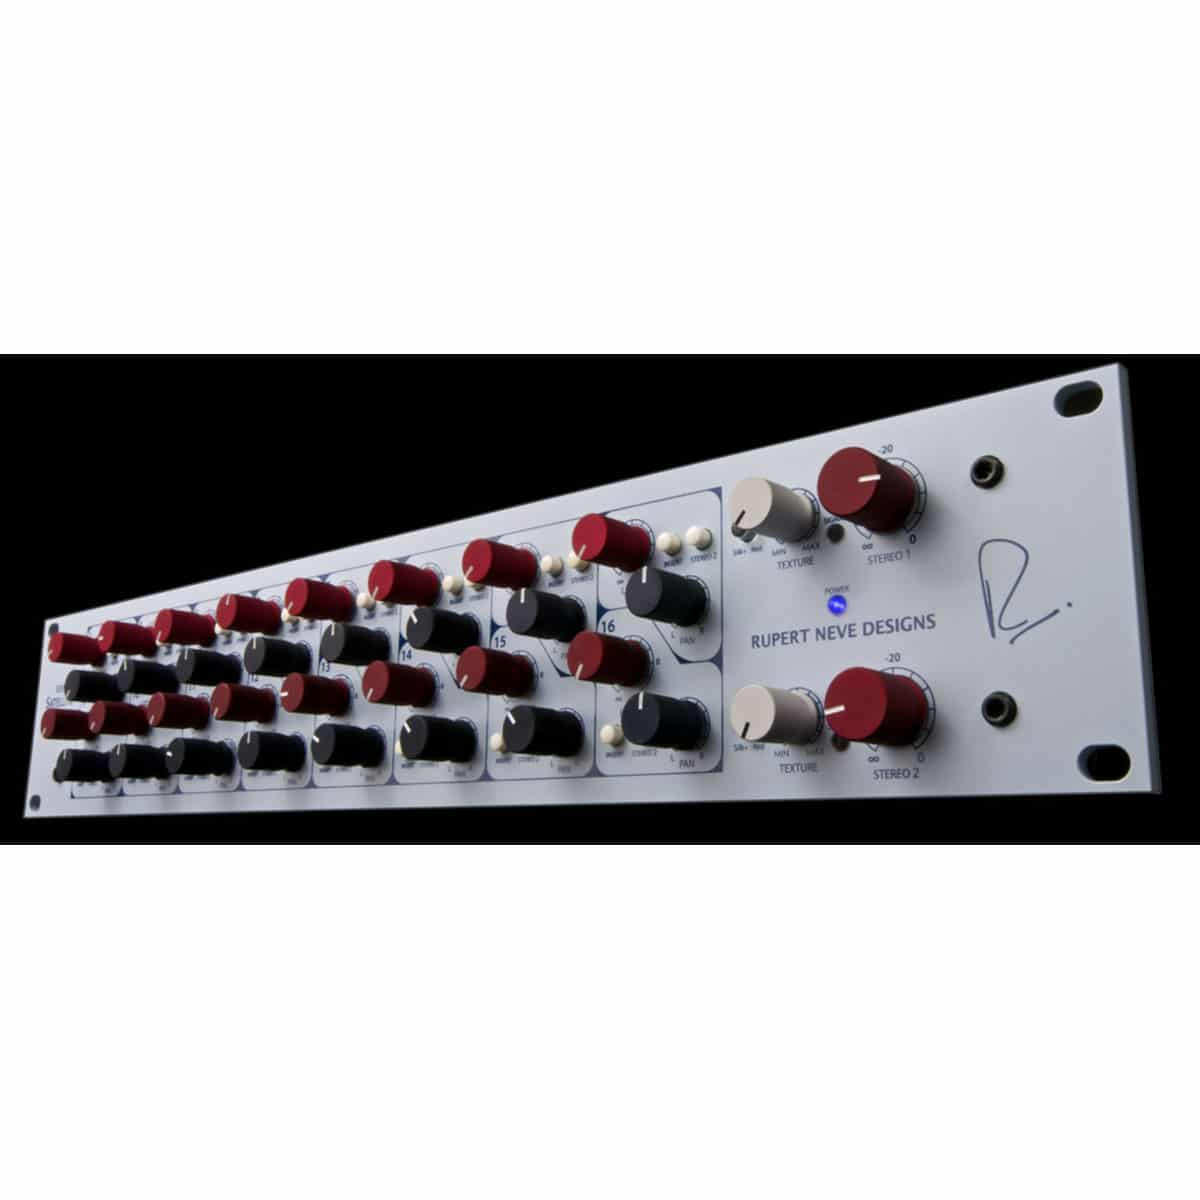 Rupert Neve 5059 16 x 2+2 Satellite Summing Mixer Pro Audio, Outboard, Sommatori e Mixer Rupert Neve 5059 Satellite 03